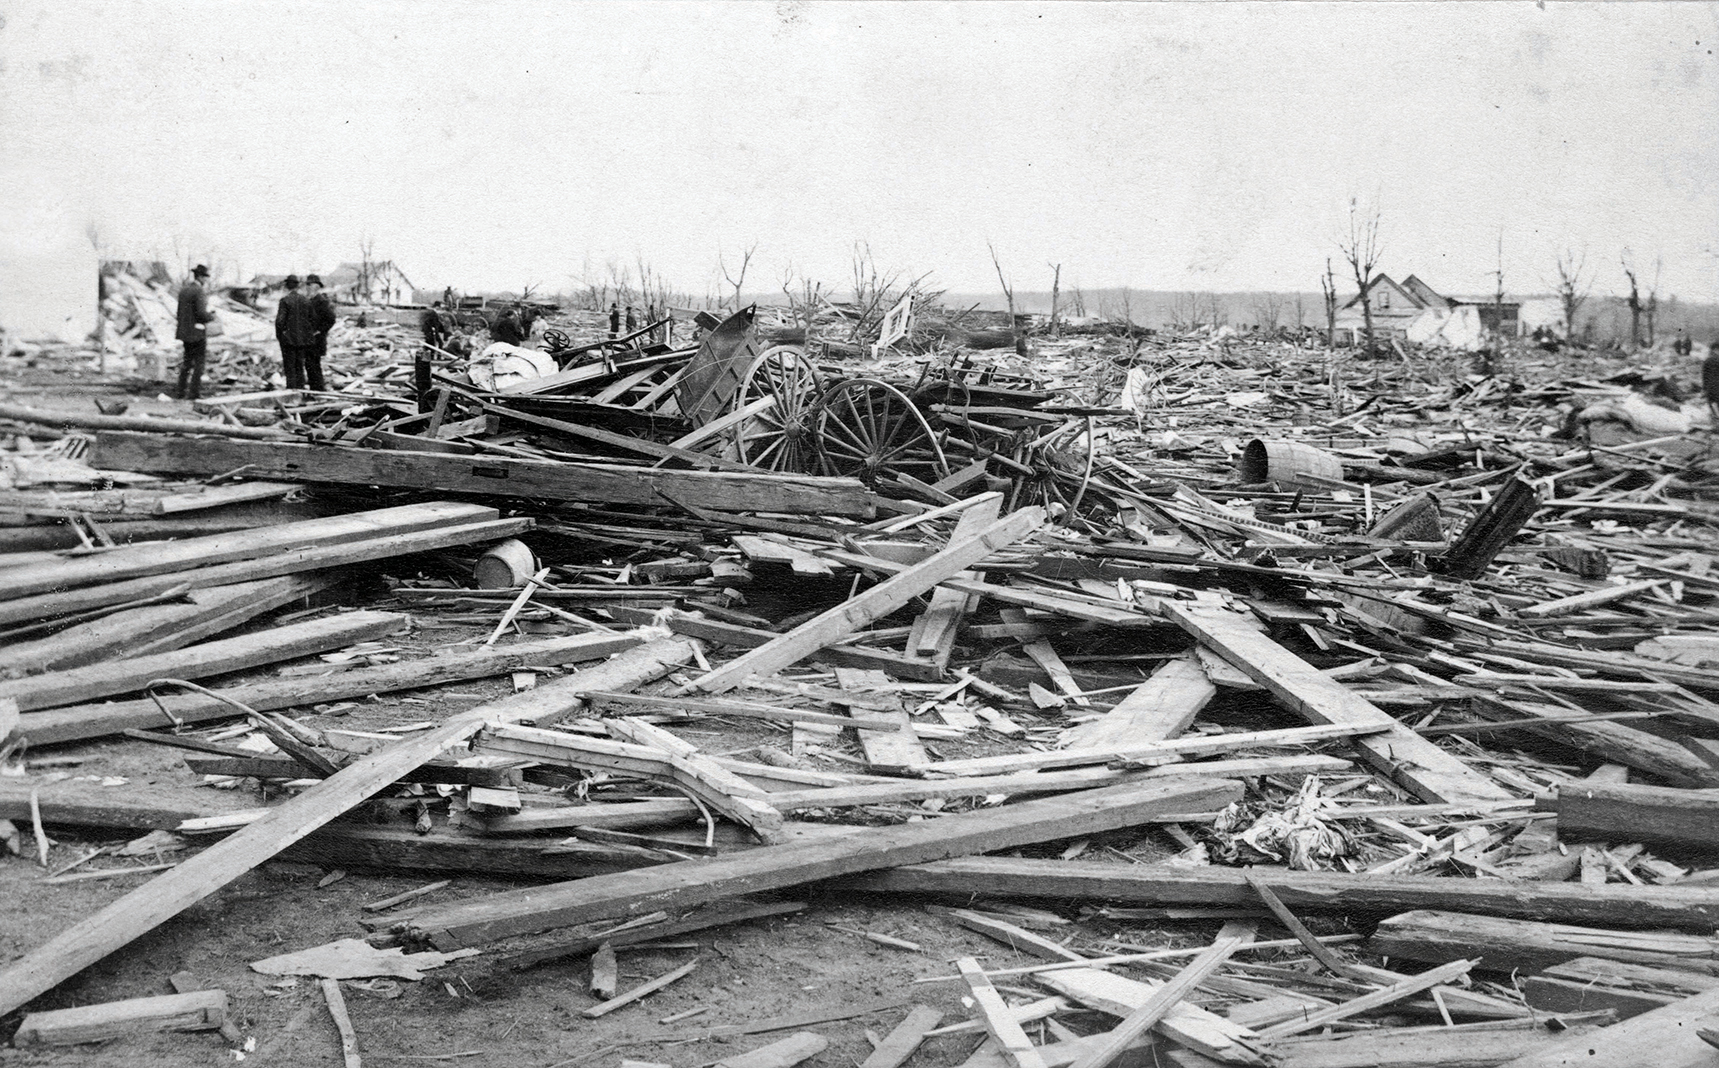 Tornado damage in Sauk Rapids in 1886